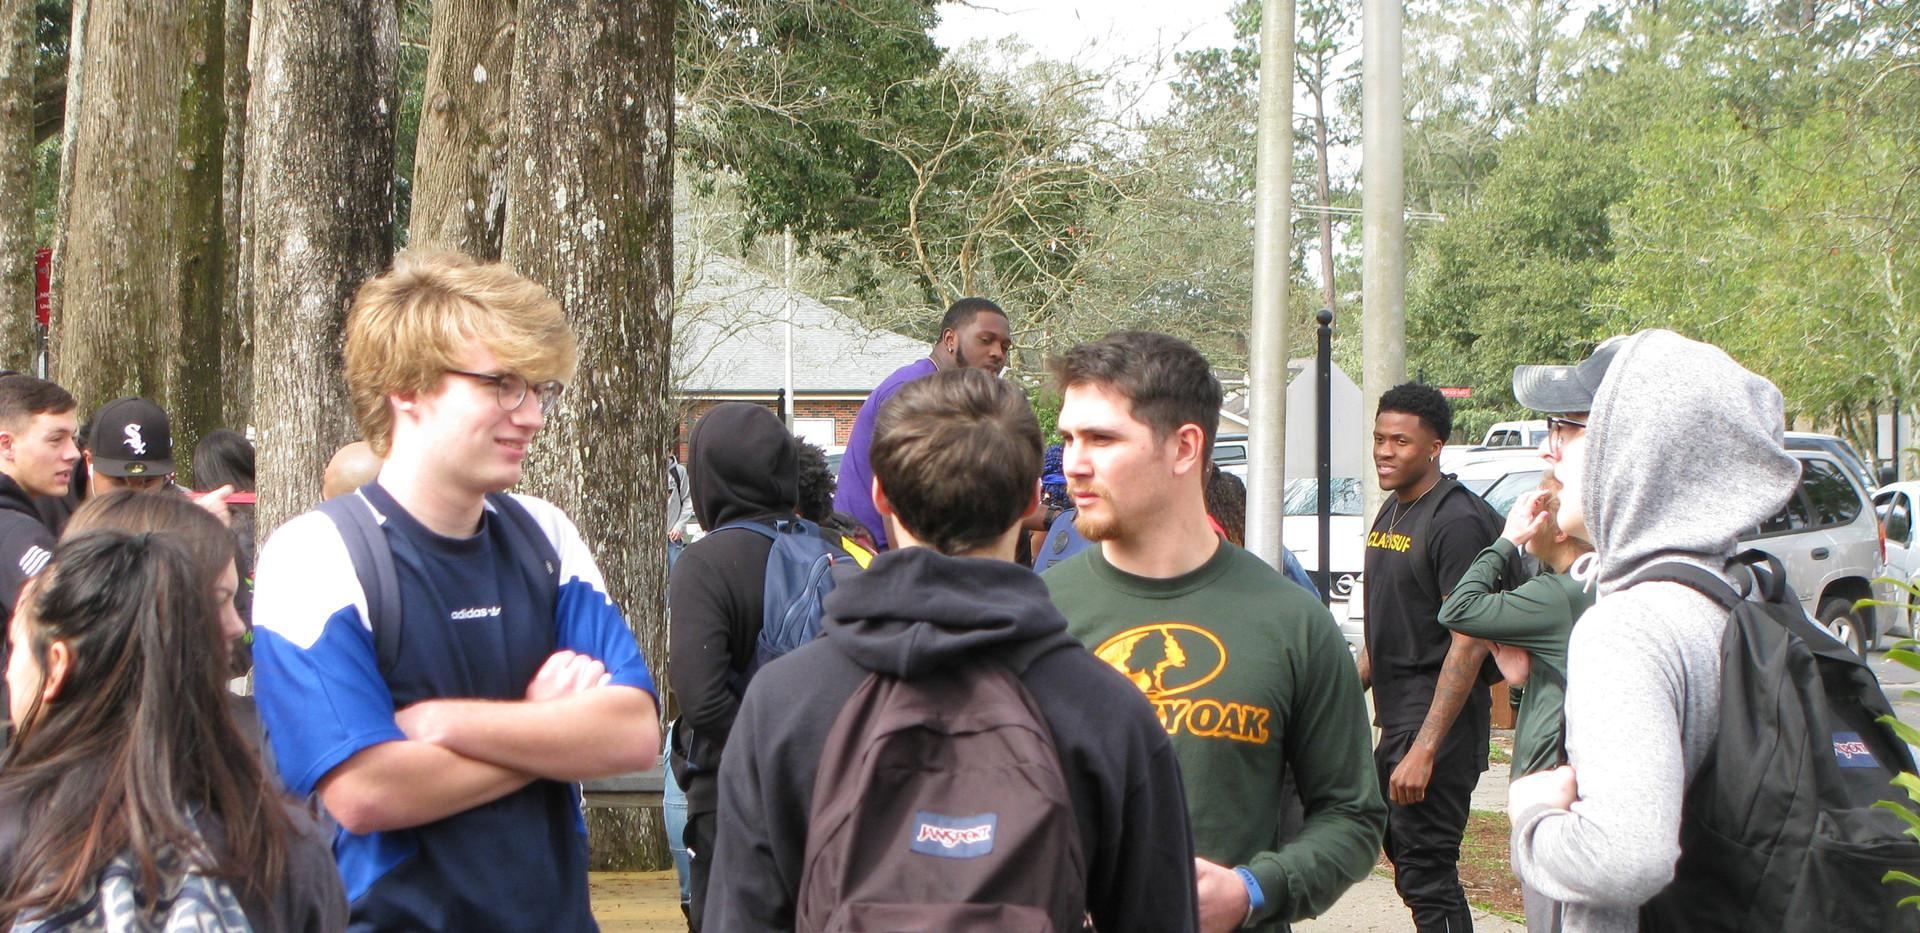 32. Seth sharing the gospel at Nicholls